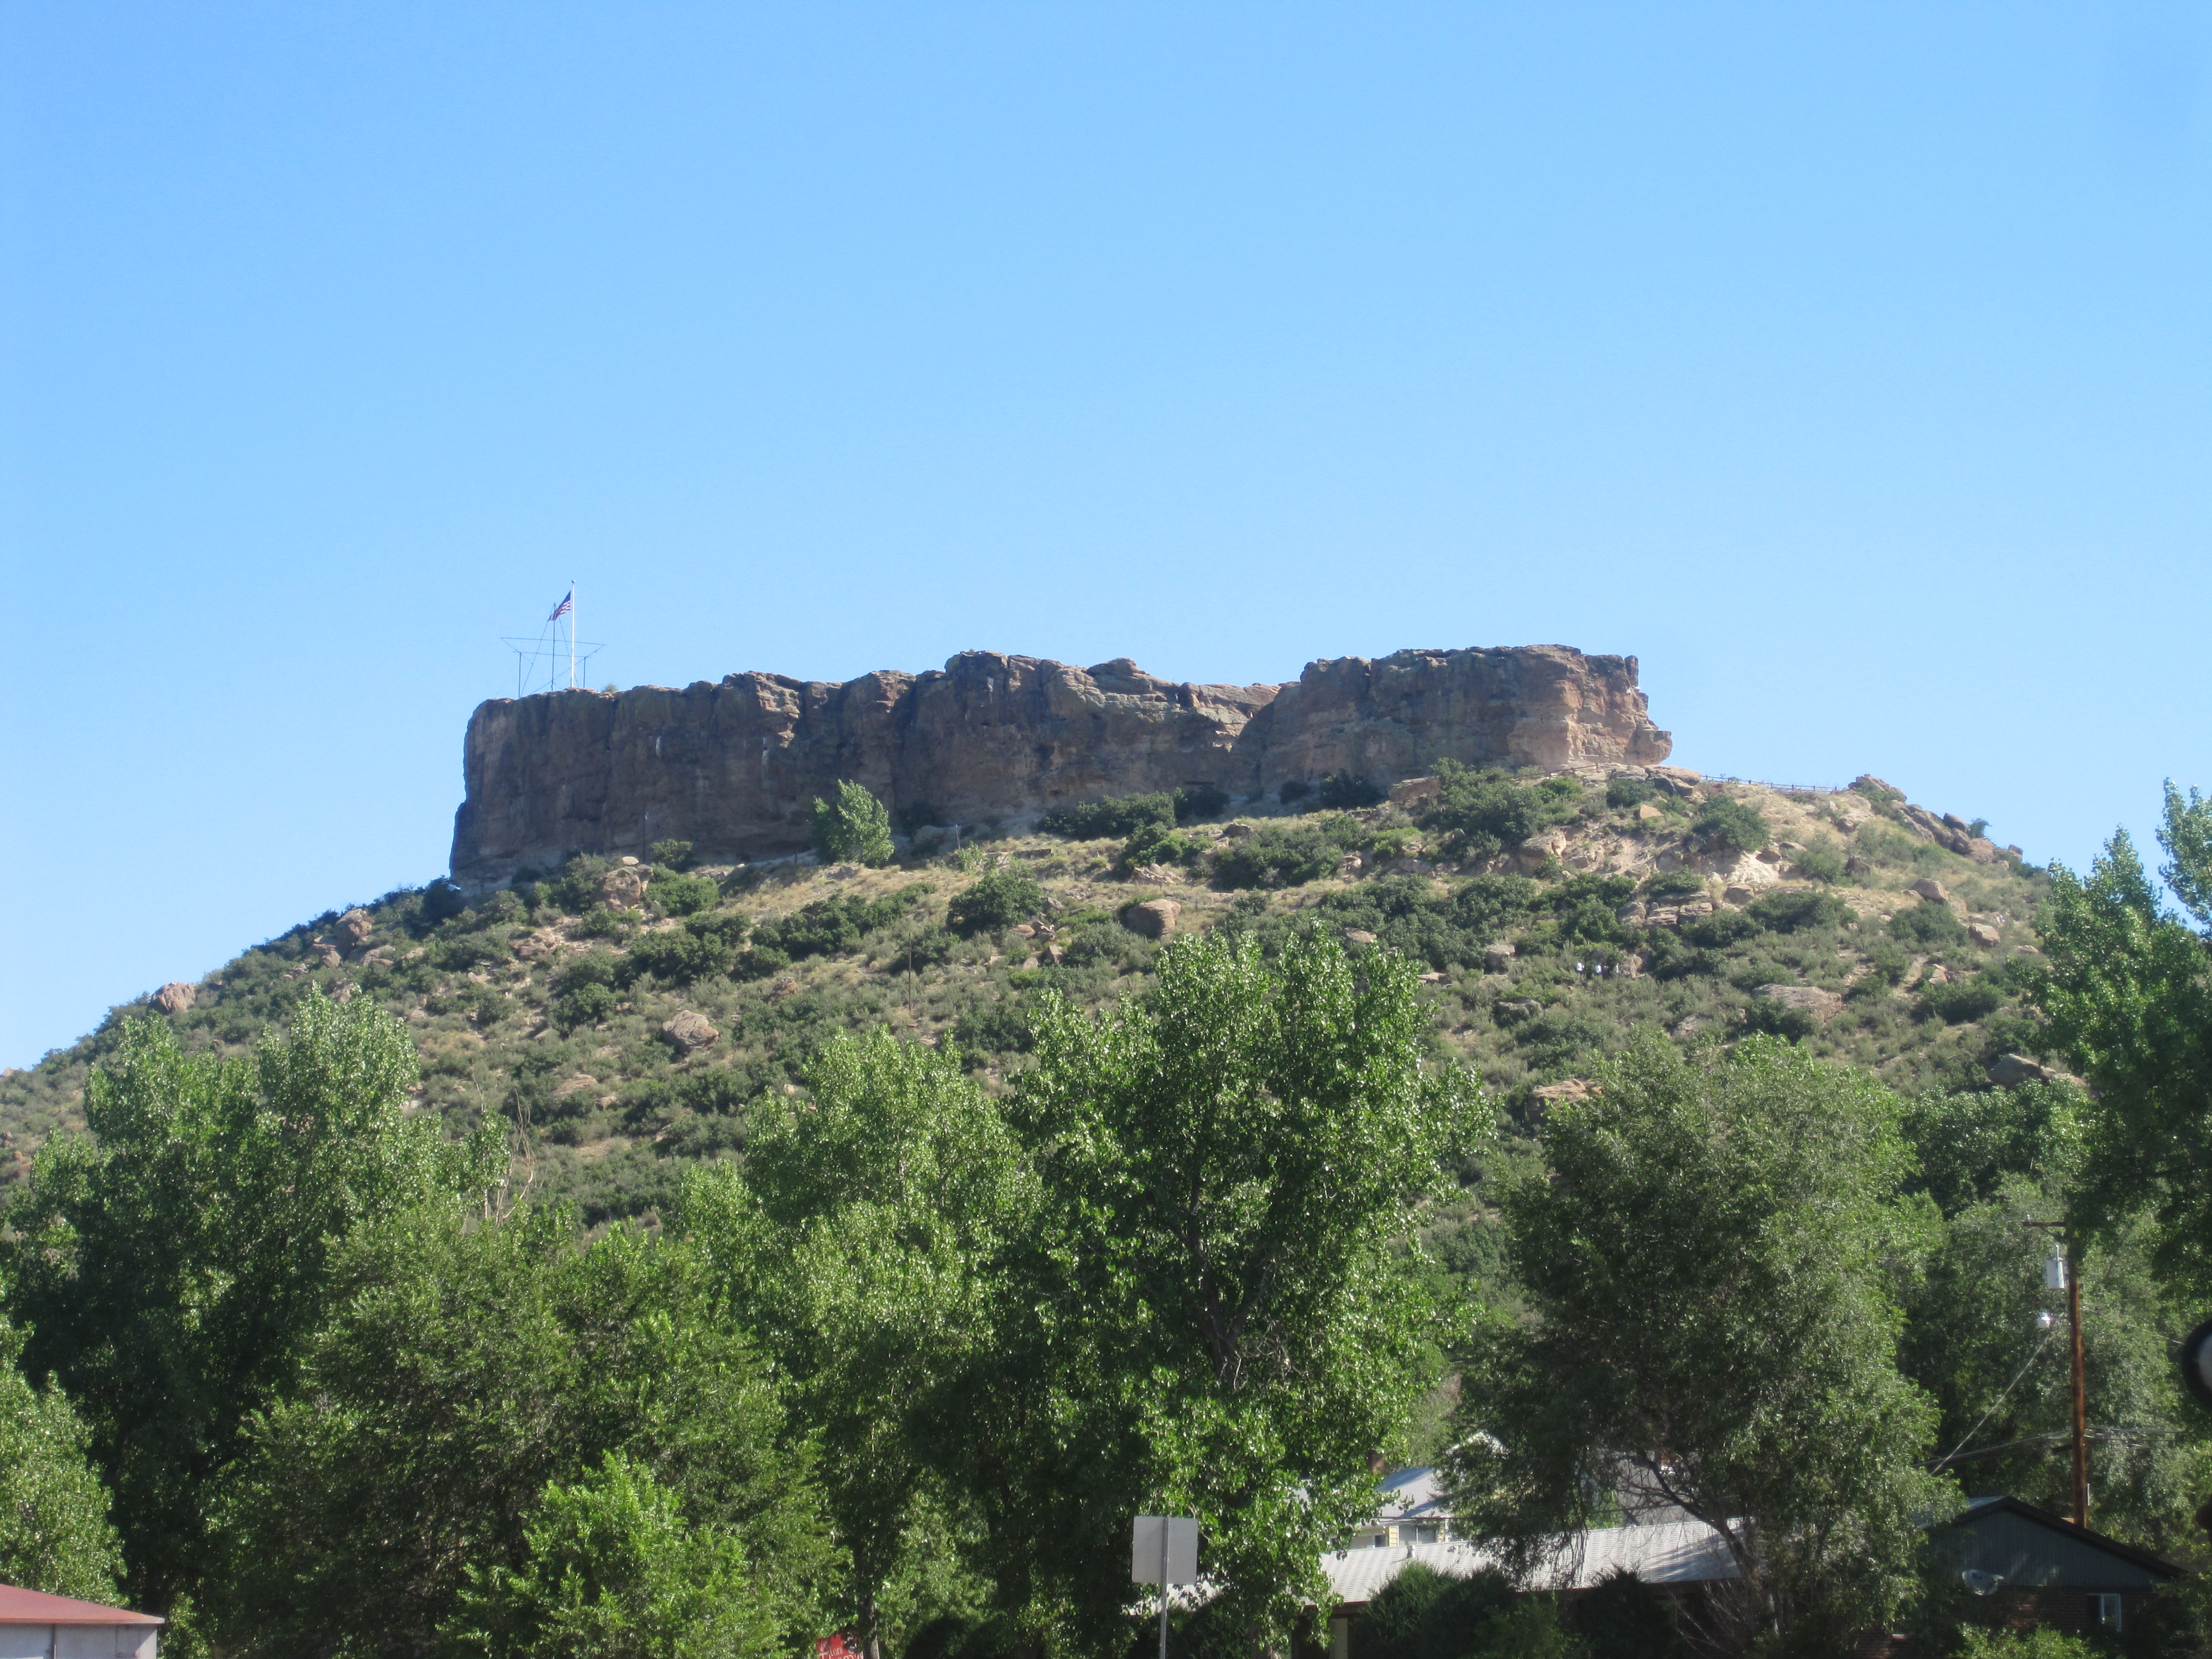 File:The rock of Castle Rock IMG 5189.JPG - Wikimedia Commons